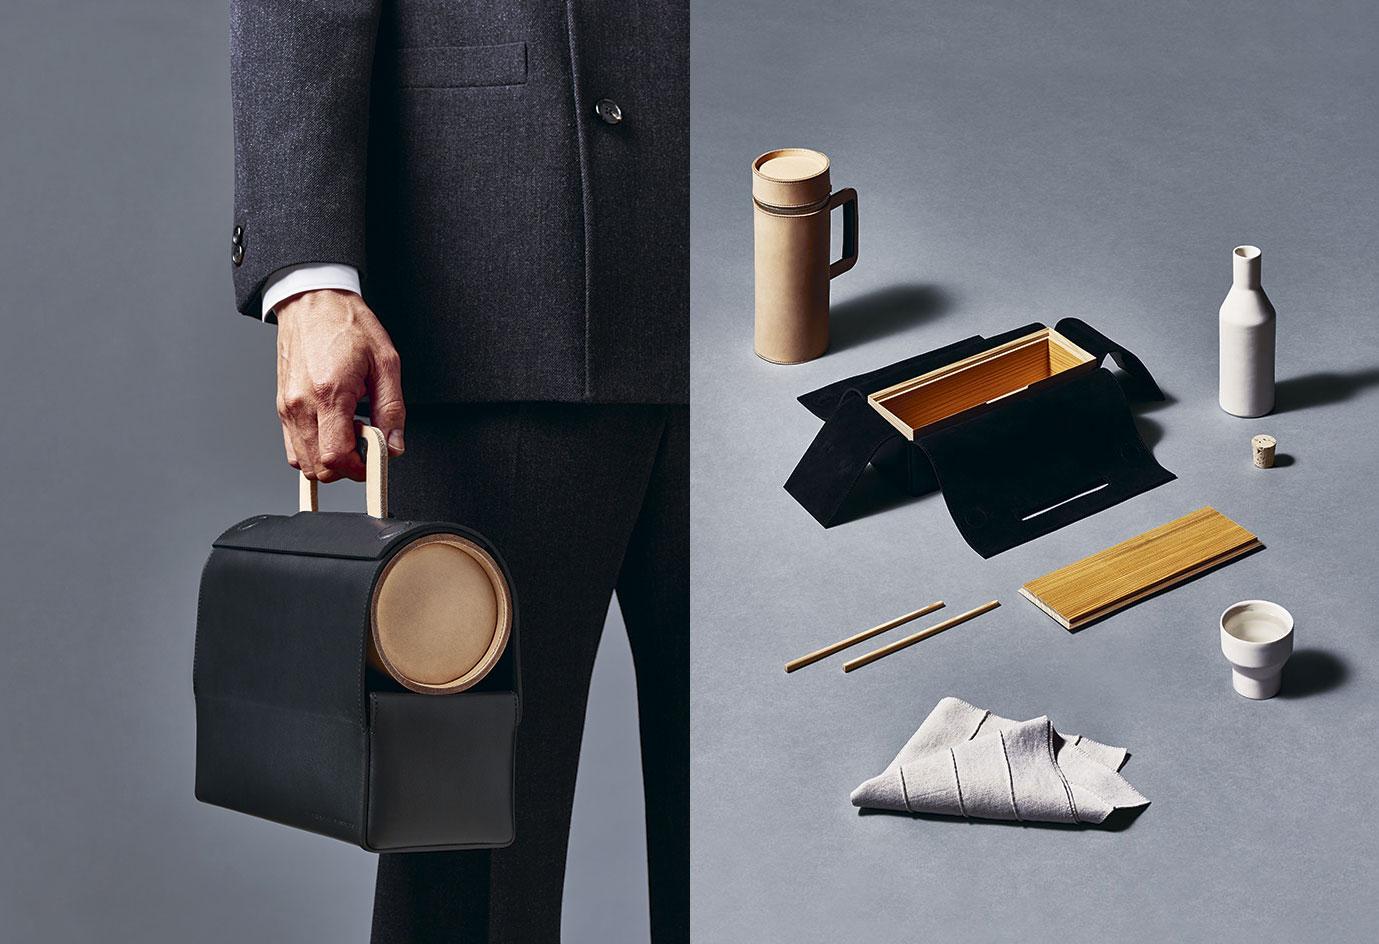 yabu lunch kit.jpg